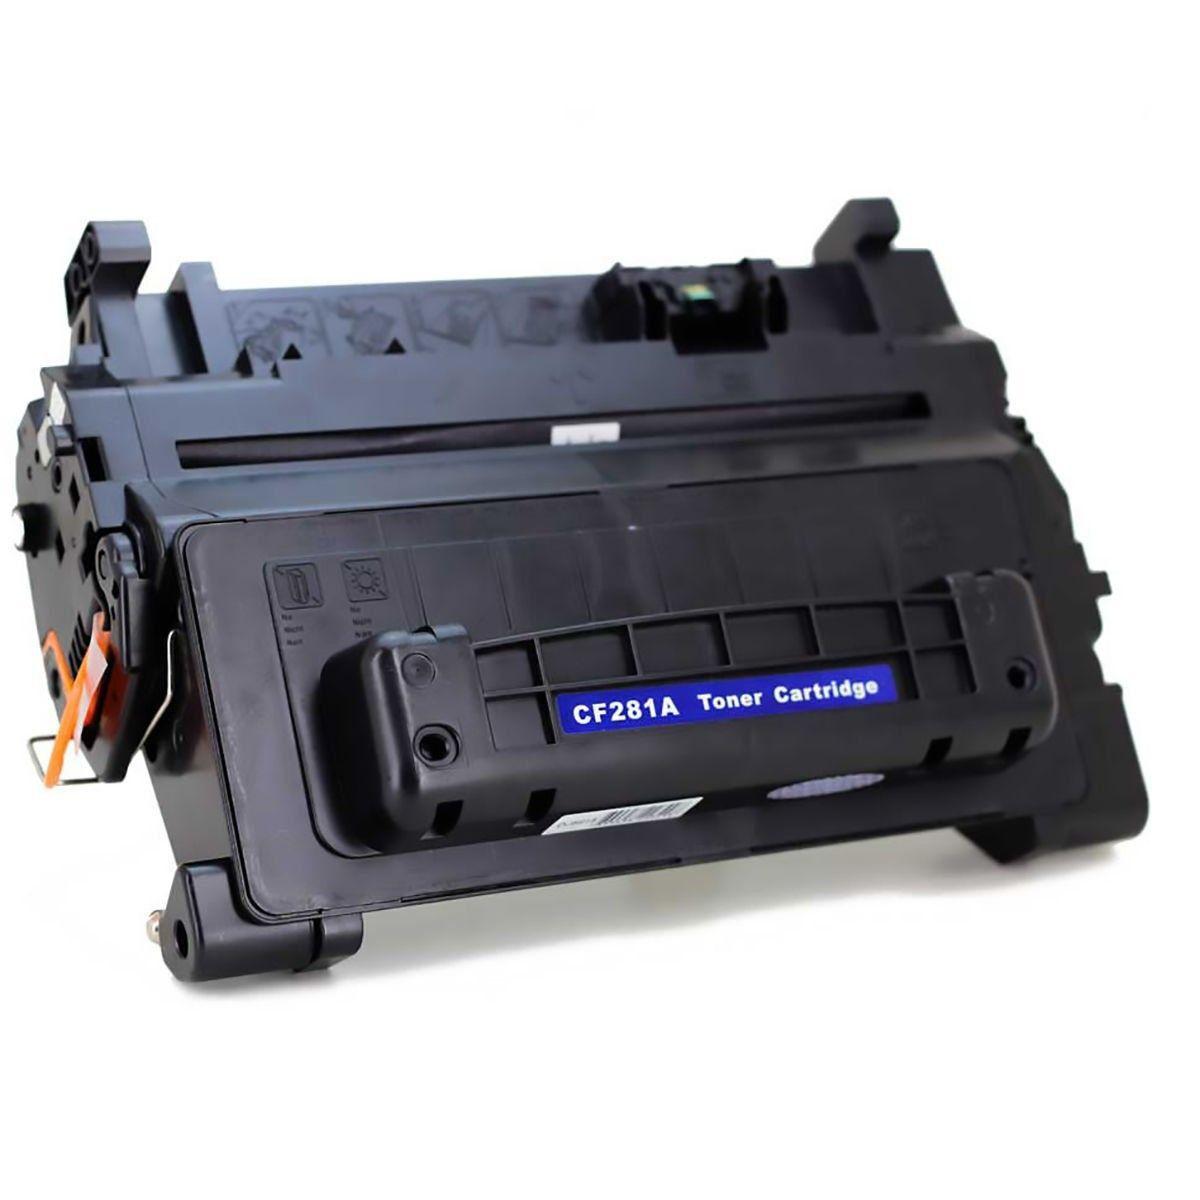 Compatível: Toner CF281A 281A 81A para HP M601 M602 M603 M604 M605 M606 M630 M601n M602dn M603dw M606dn / Preto / 10.500